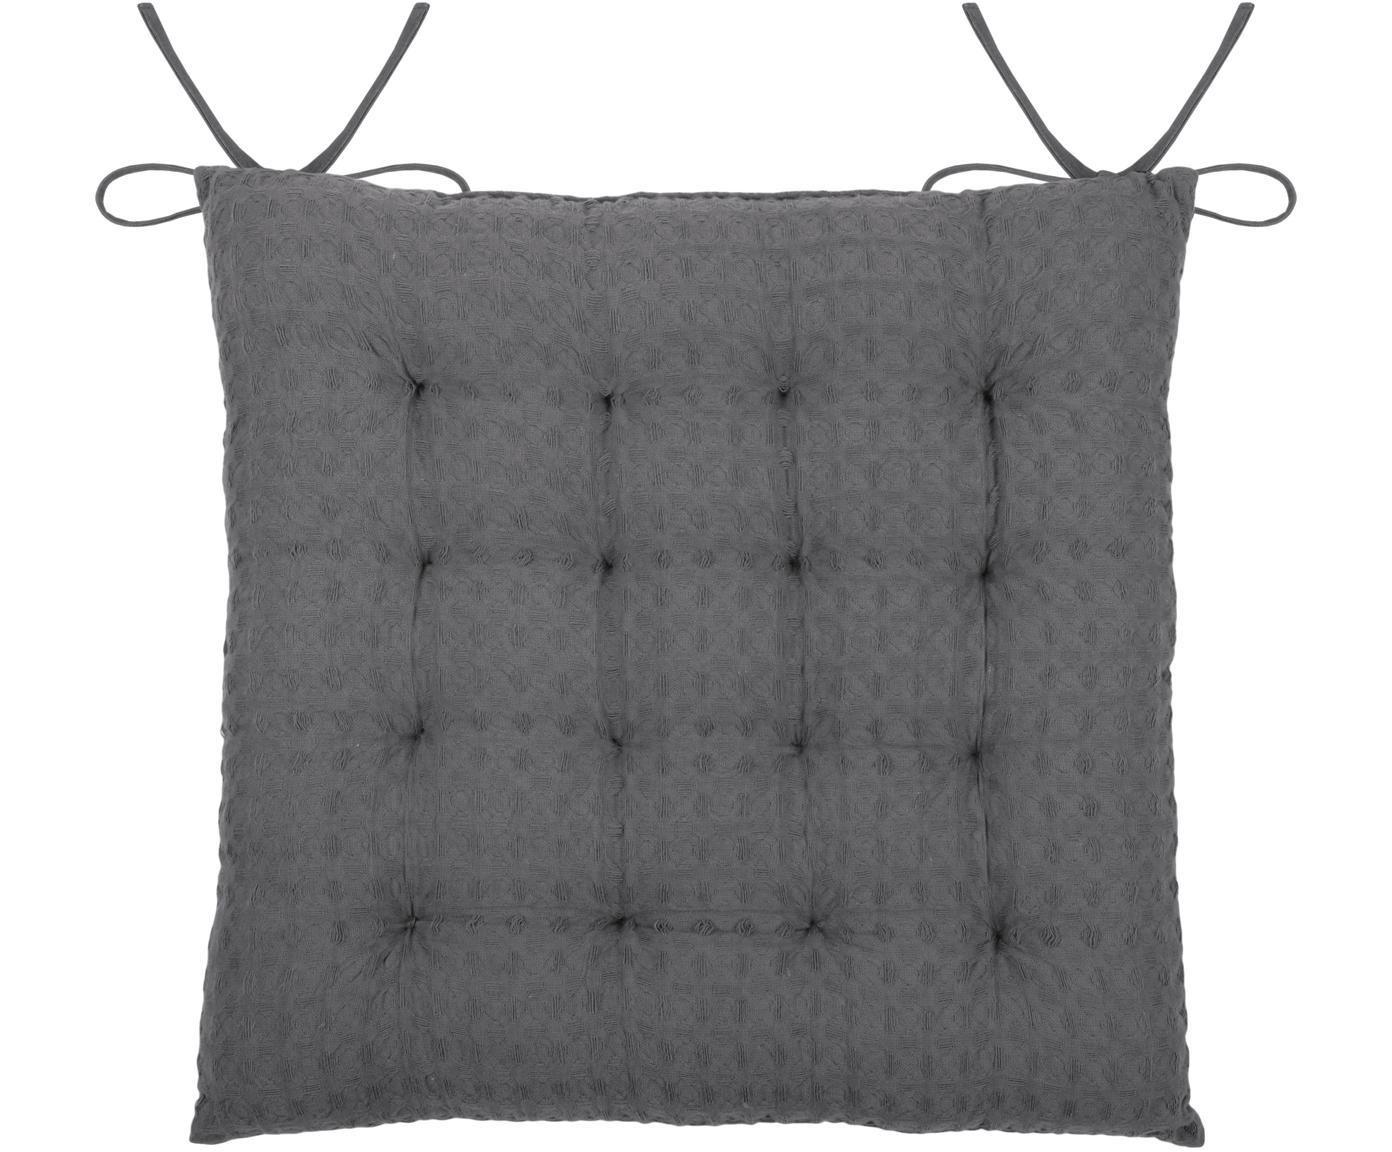 Cojín de asiento Gopher, Funda: 100%algodón, Gris oscuro, An 40 x L 40 cm